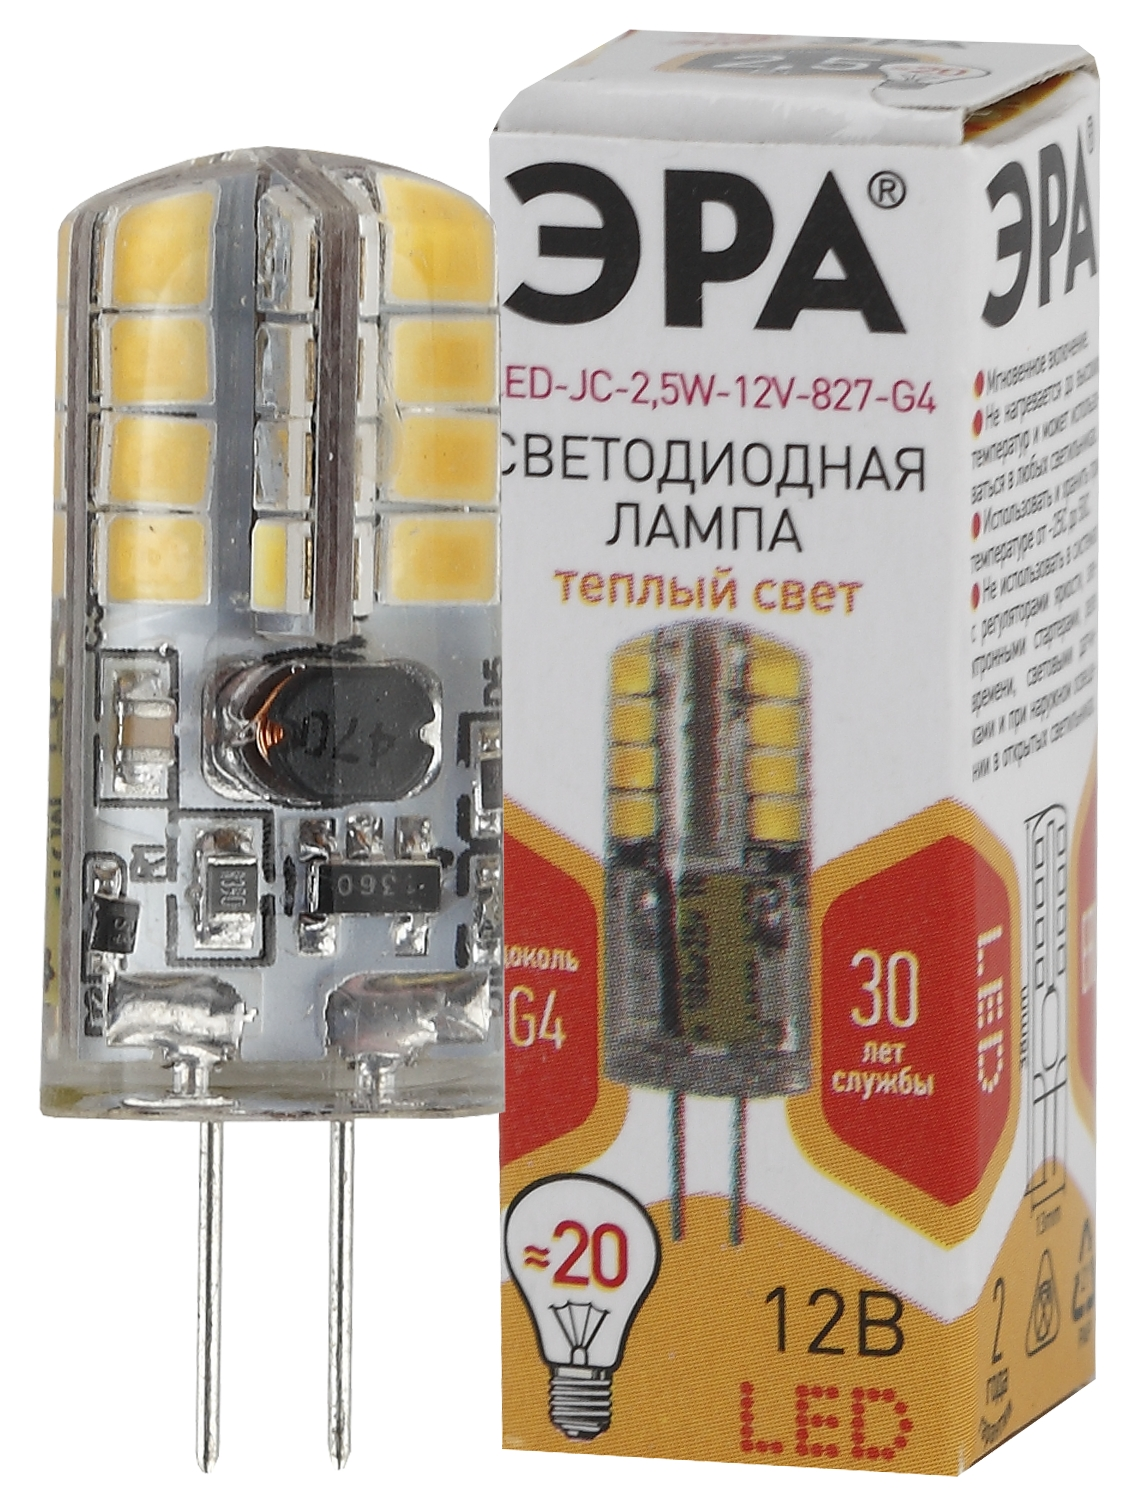 Лампа ЭРА LED-JC-2,5W-12V-827-G4